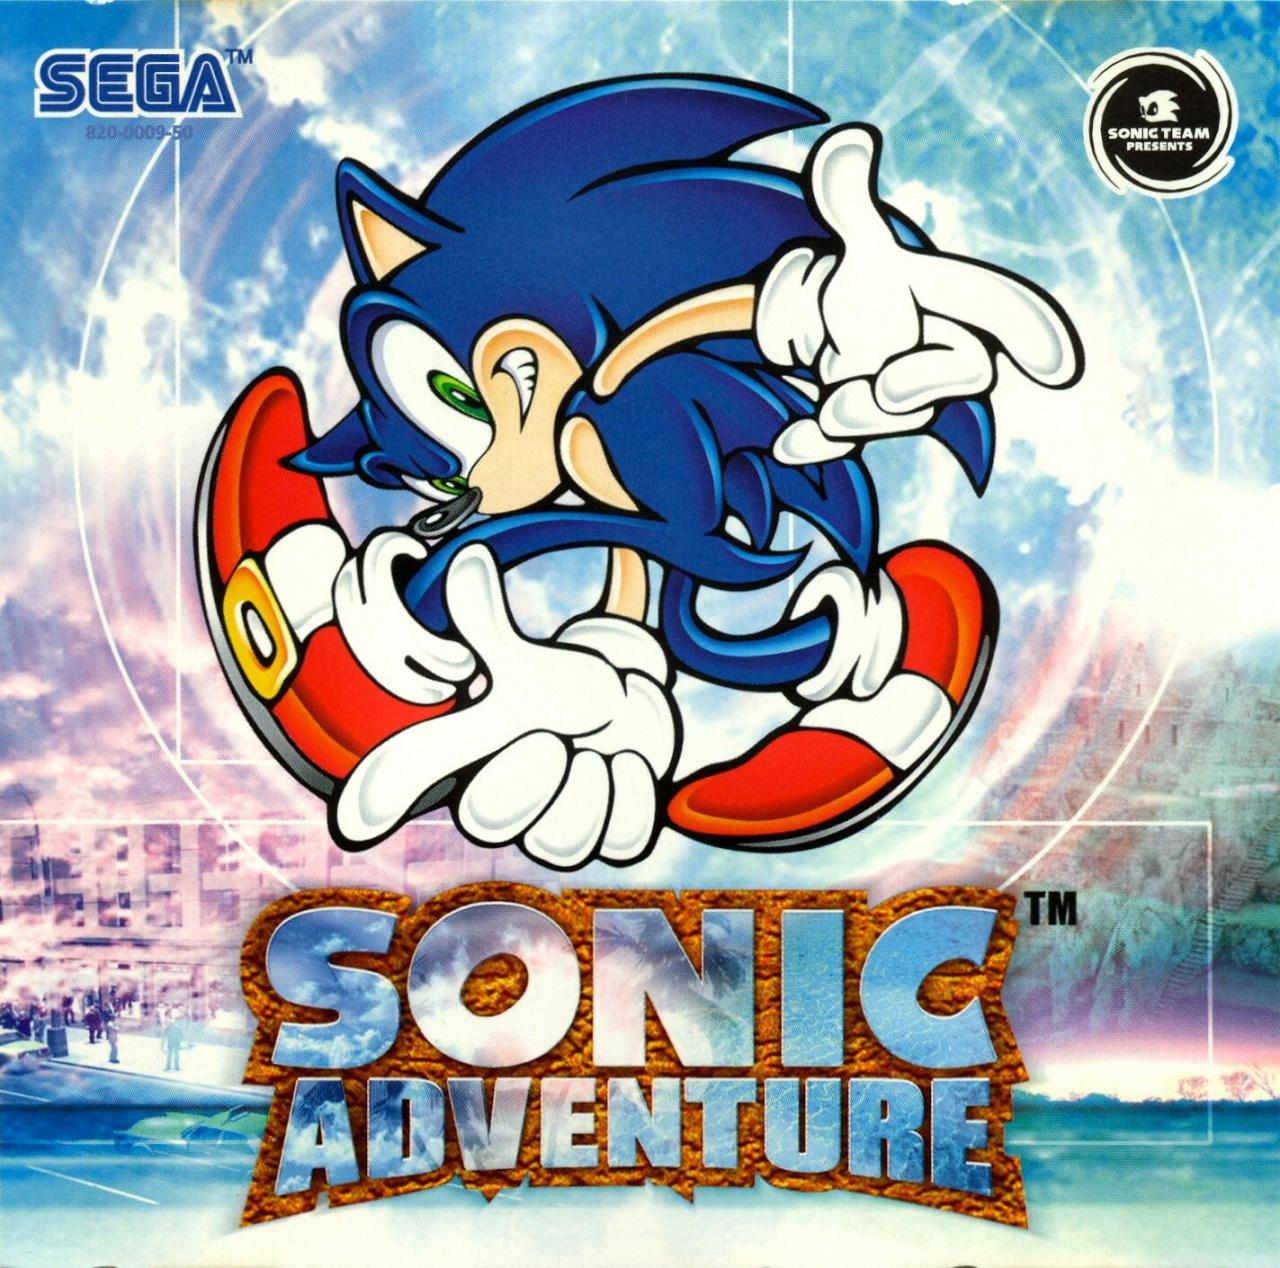 <p>Random: Scott Pilgrim Vs The World's New Cover Art Is A Parody Of Sonic Adventure thumbnail